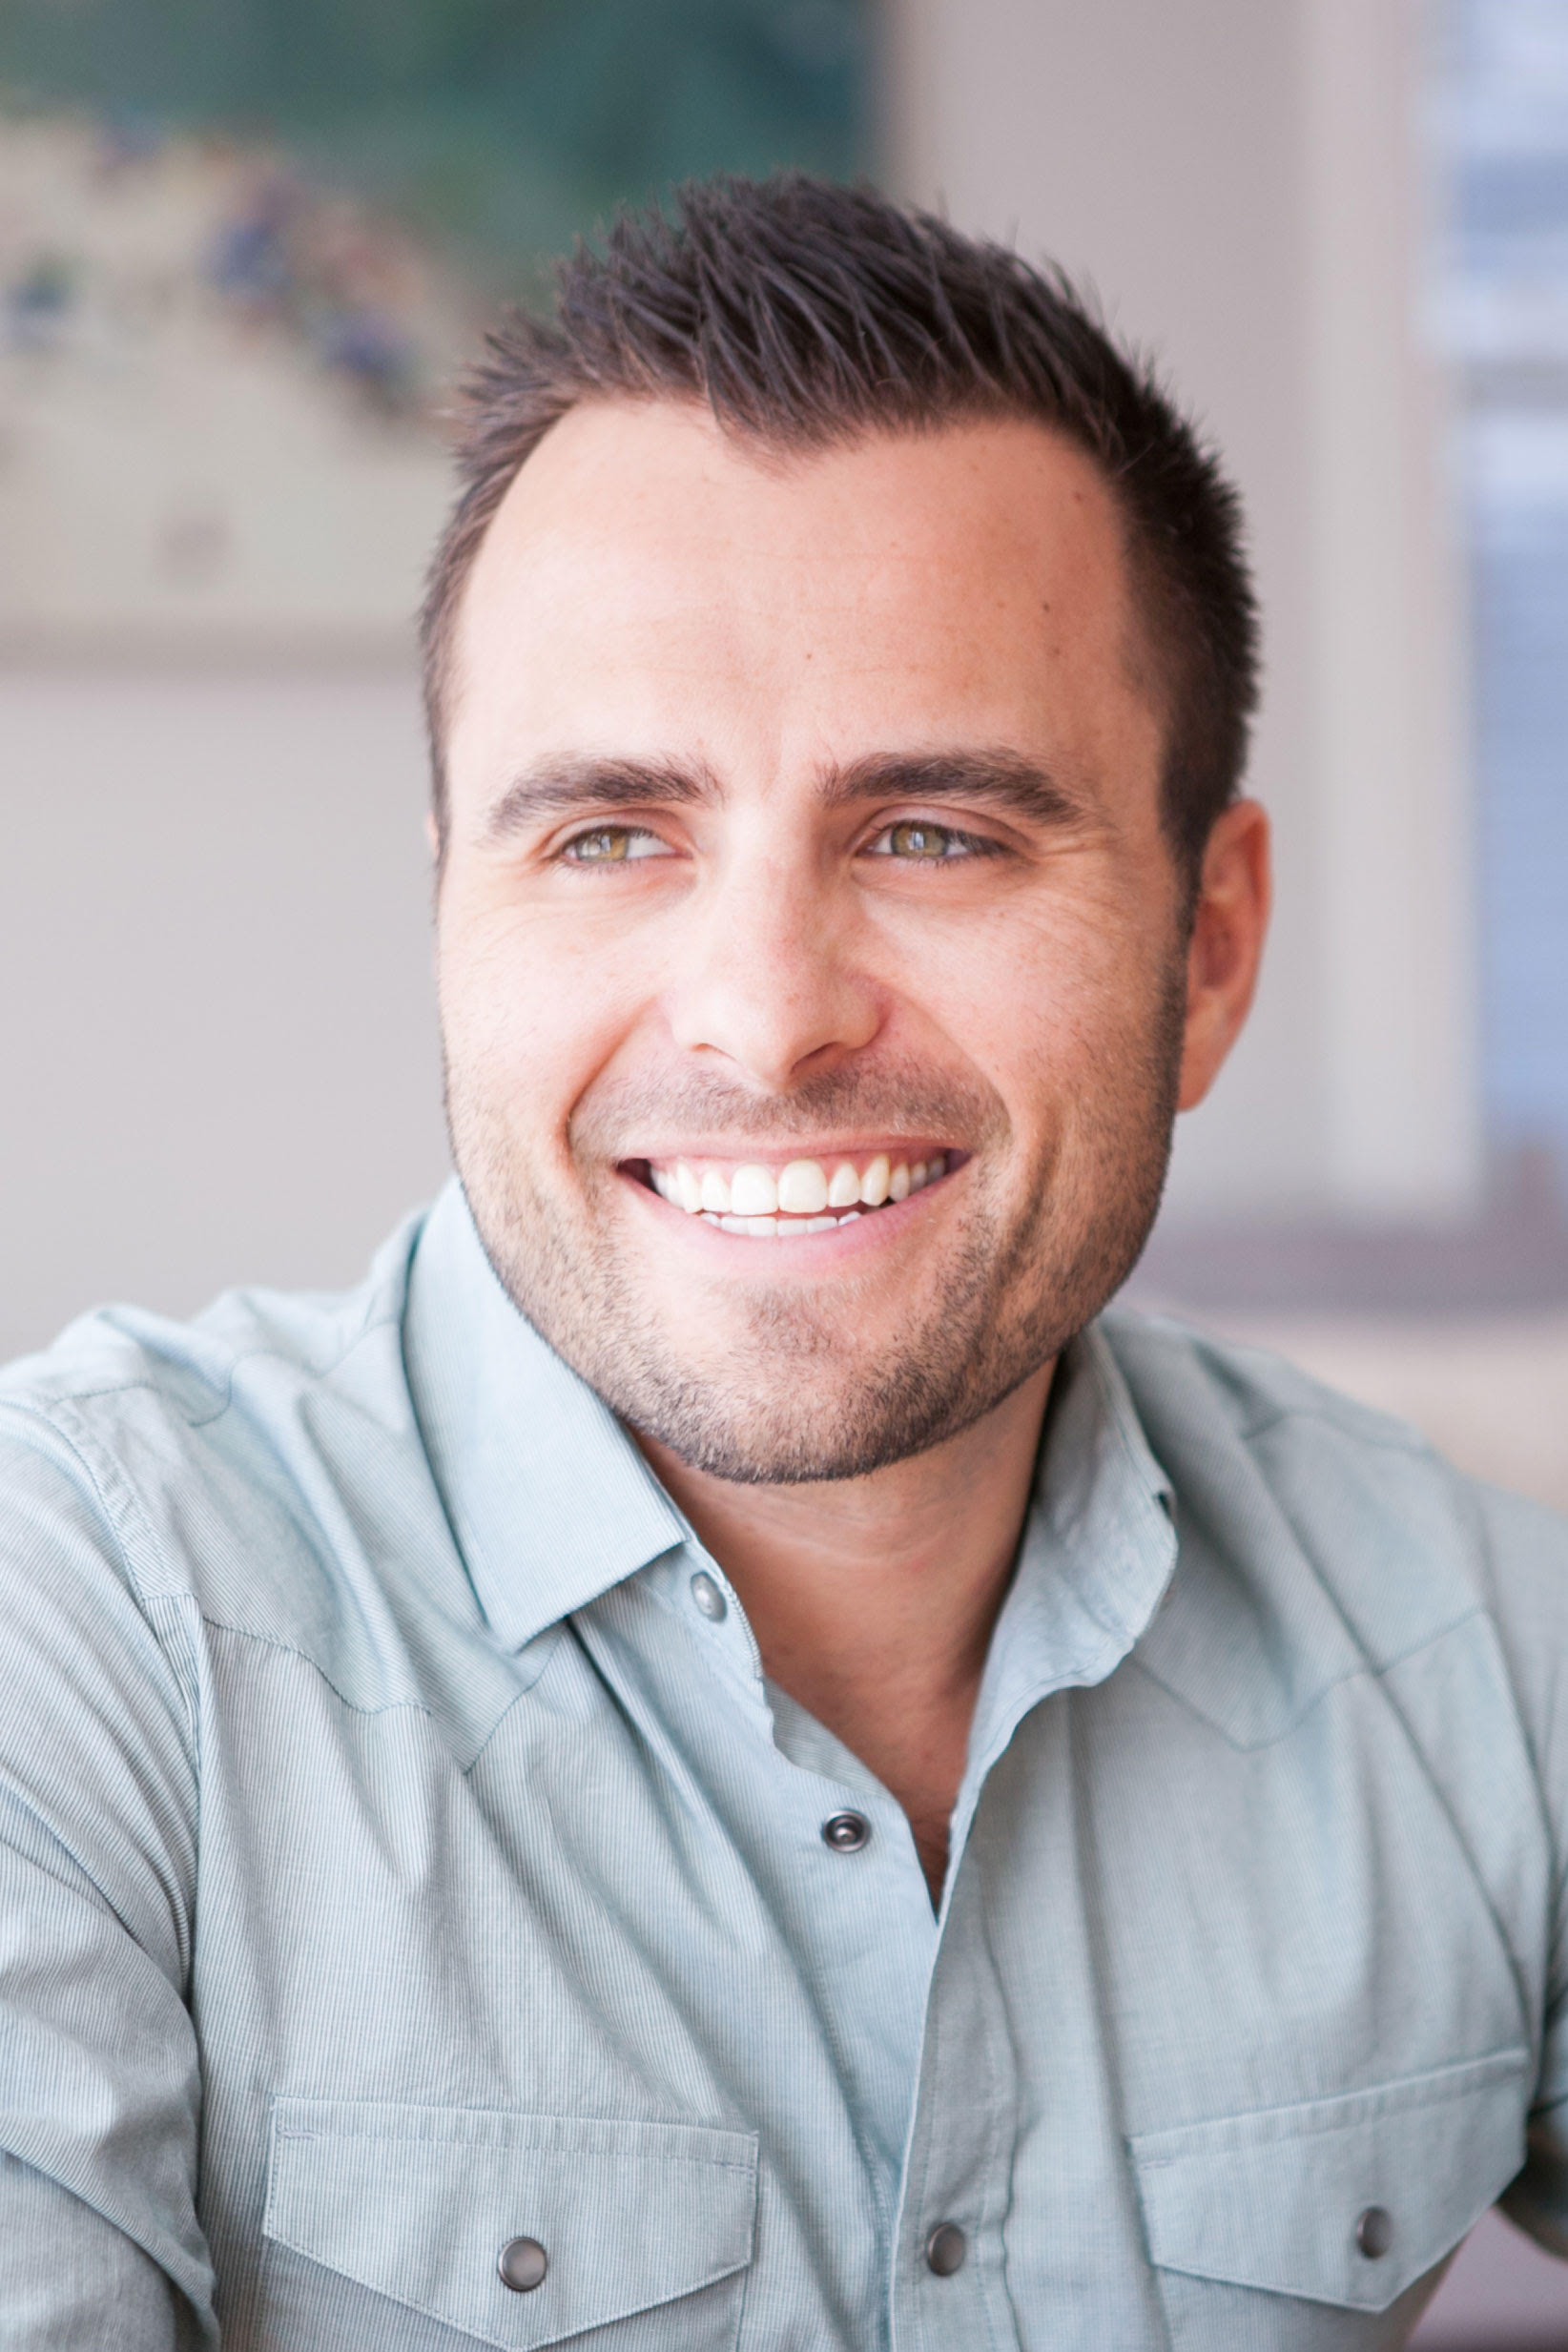 Brad Ebenhoeh - Managing Partner at Accountfully